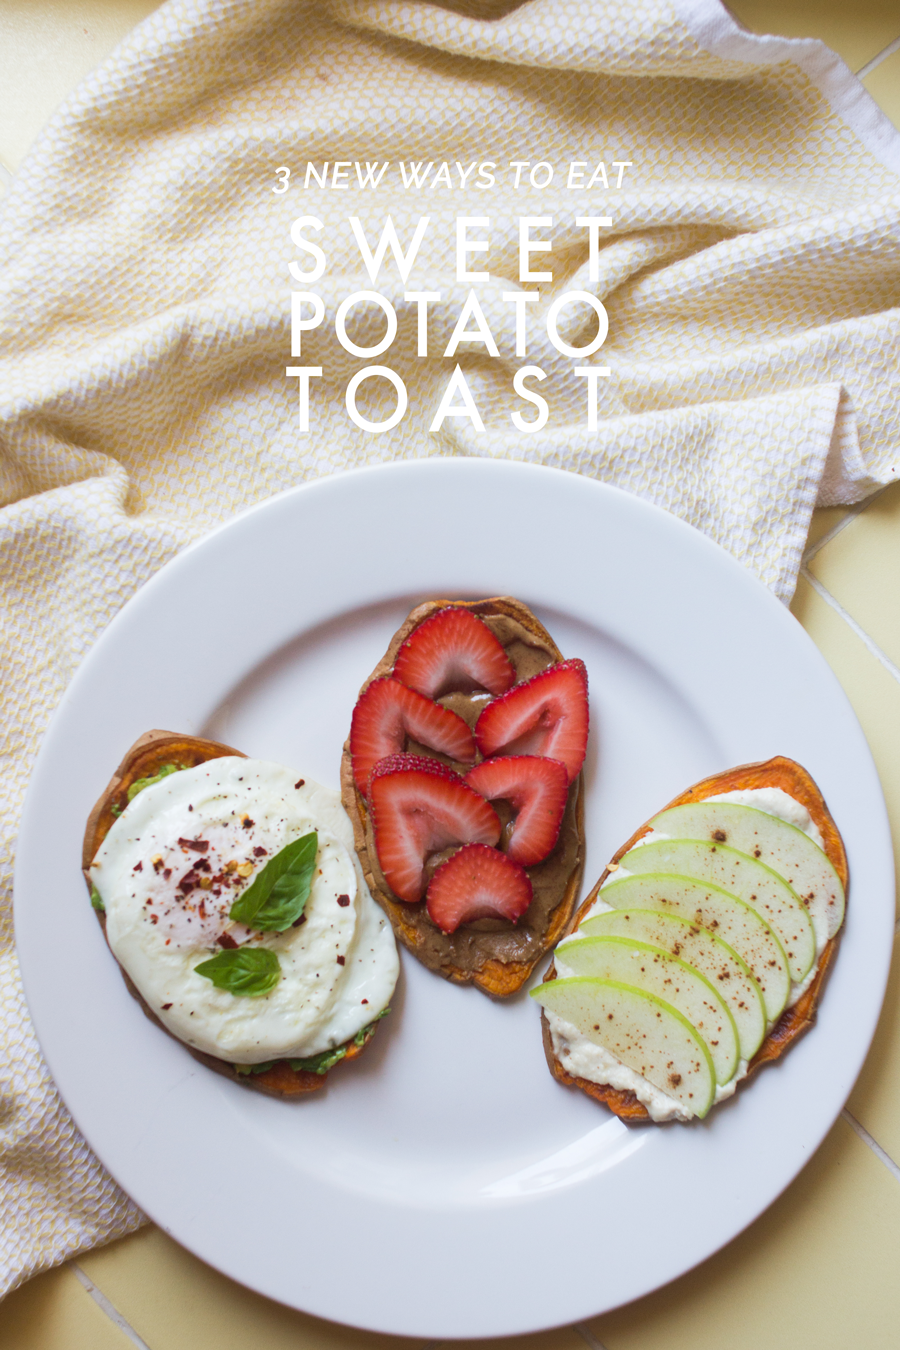 3 New Ways to Eat Sweet Potato Toast